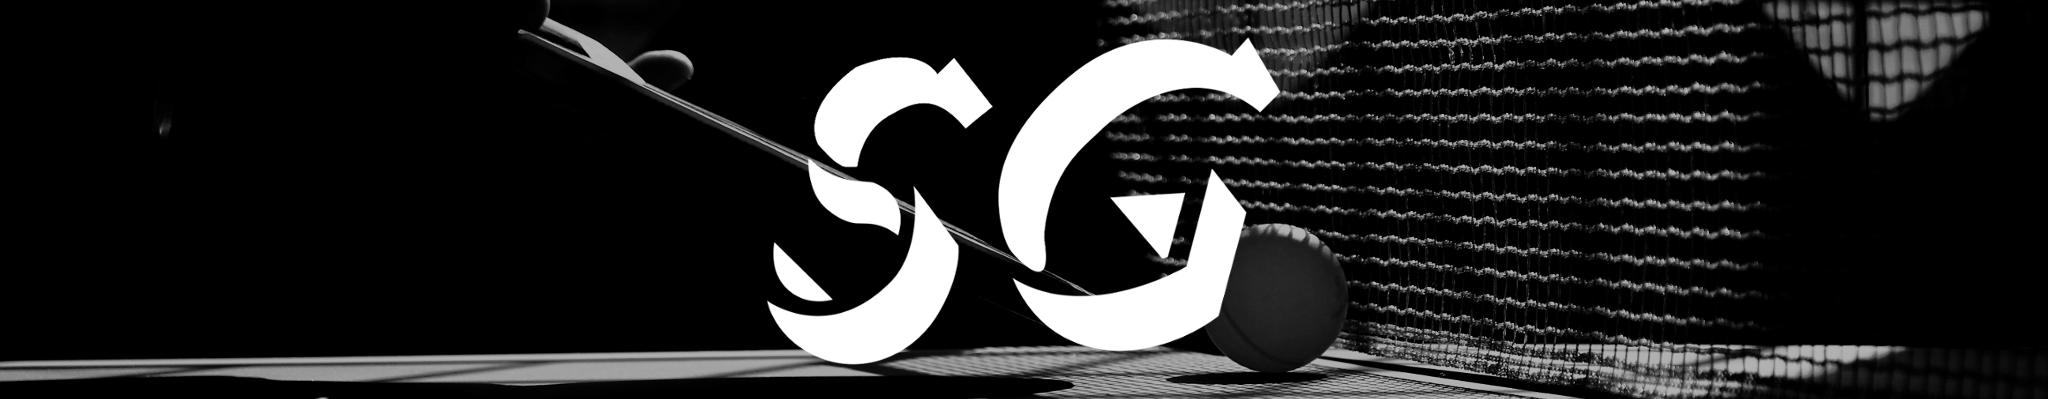 Logobanner der SG Gundelsheim